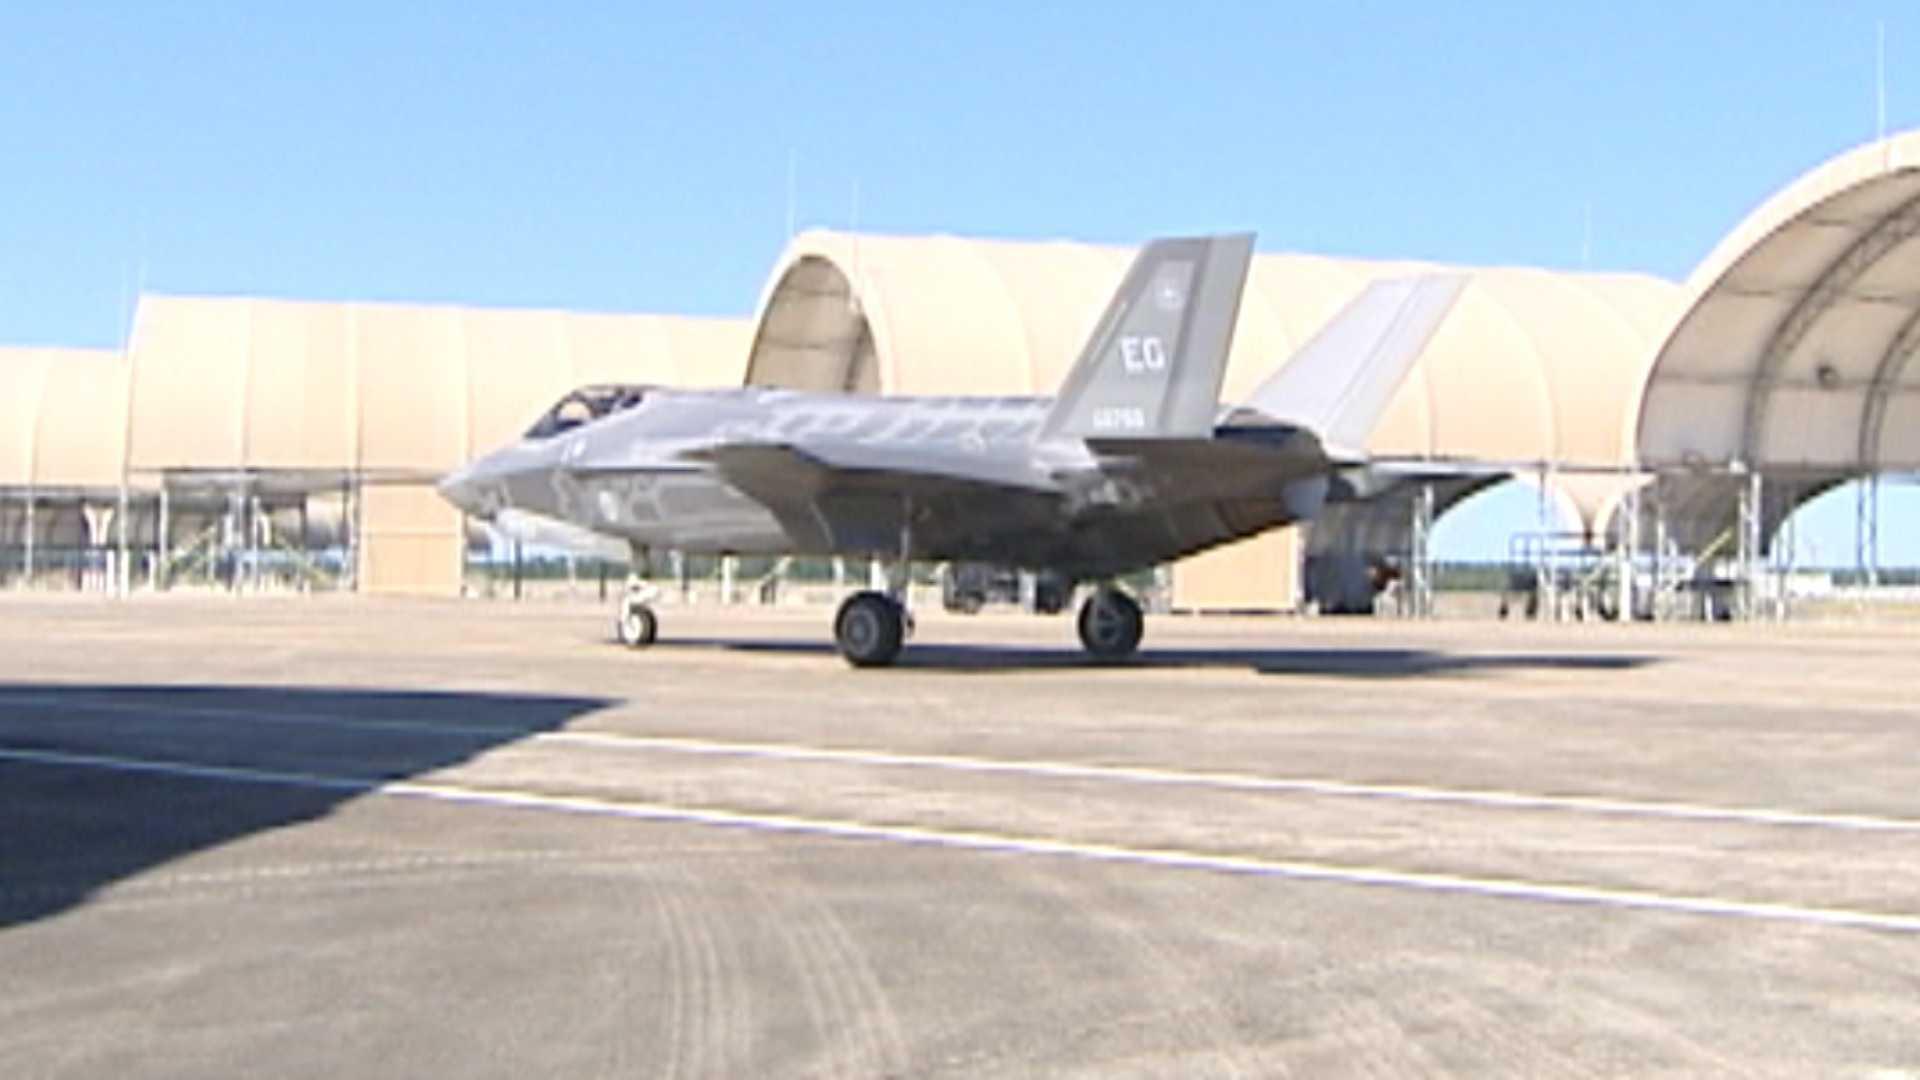 04-14-13 Report: F-35 basing data 'fudged' - img